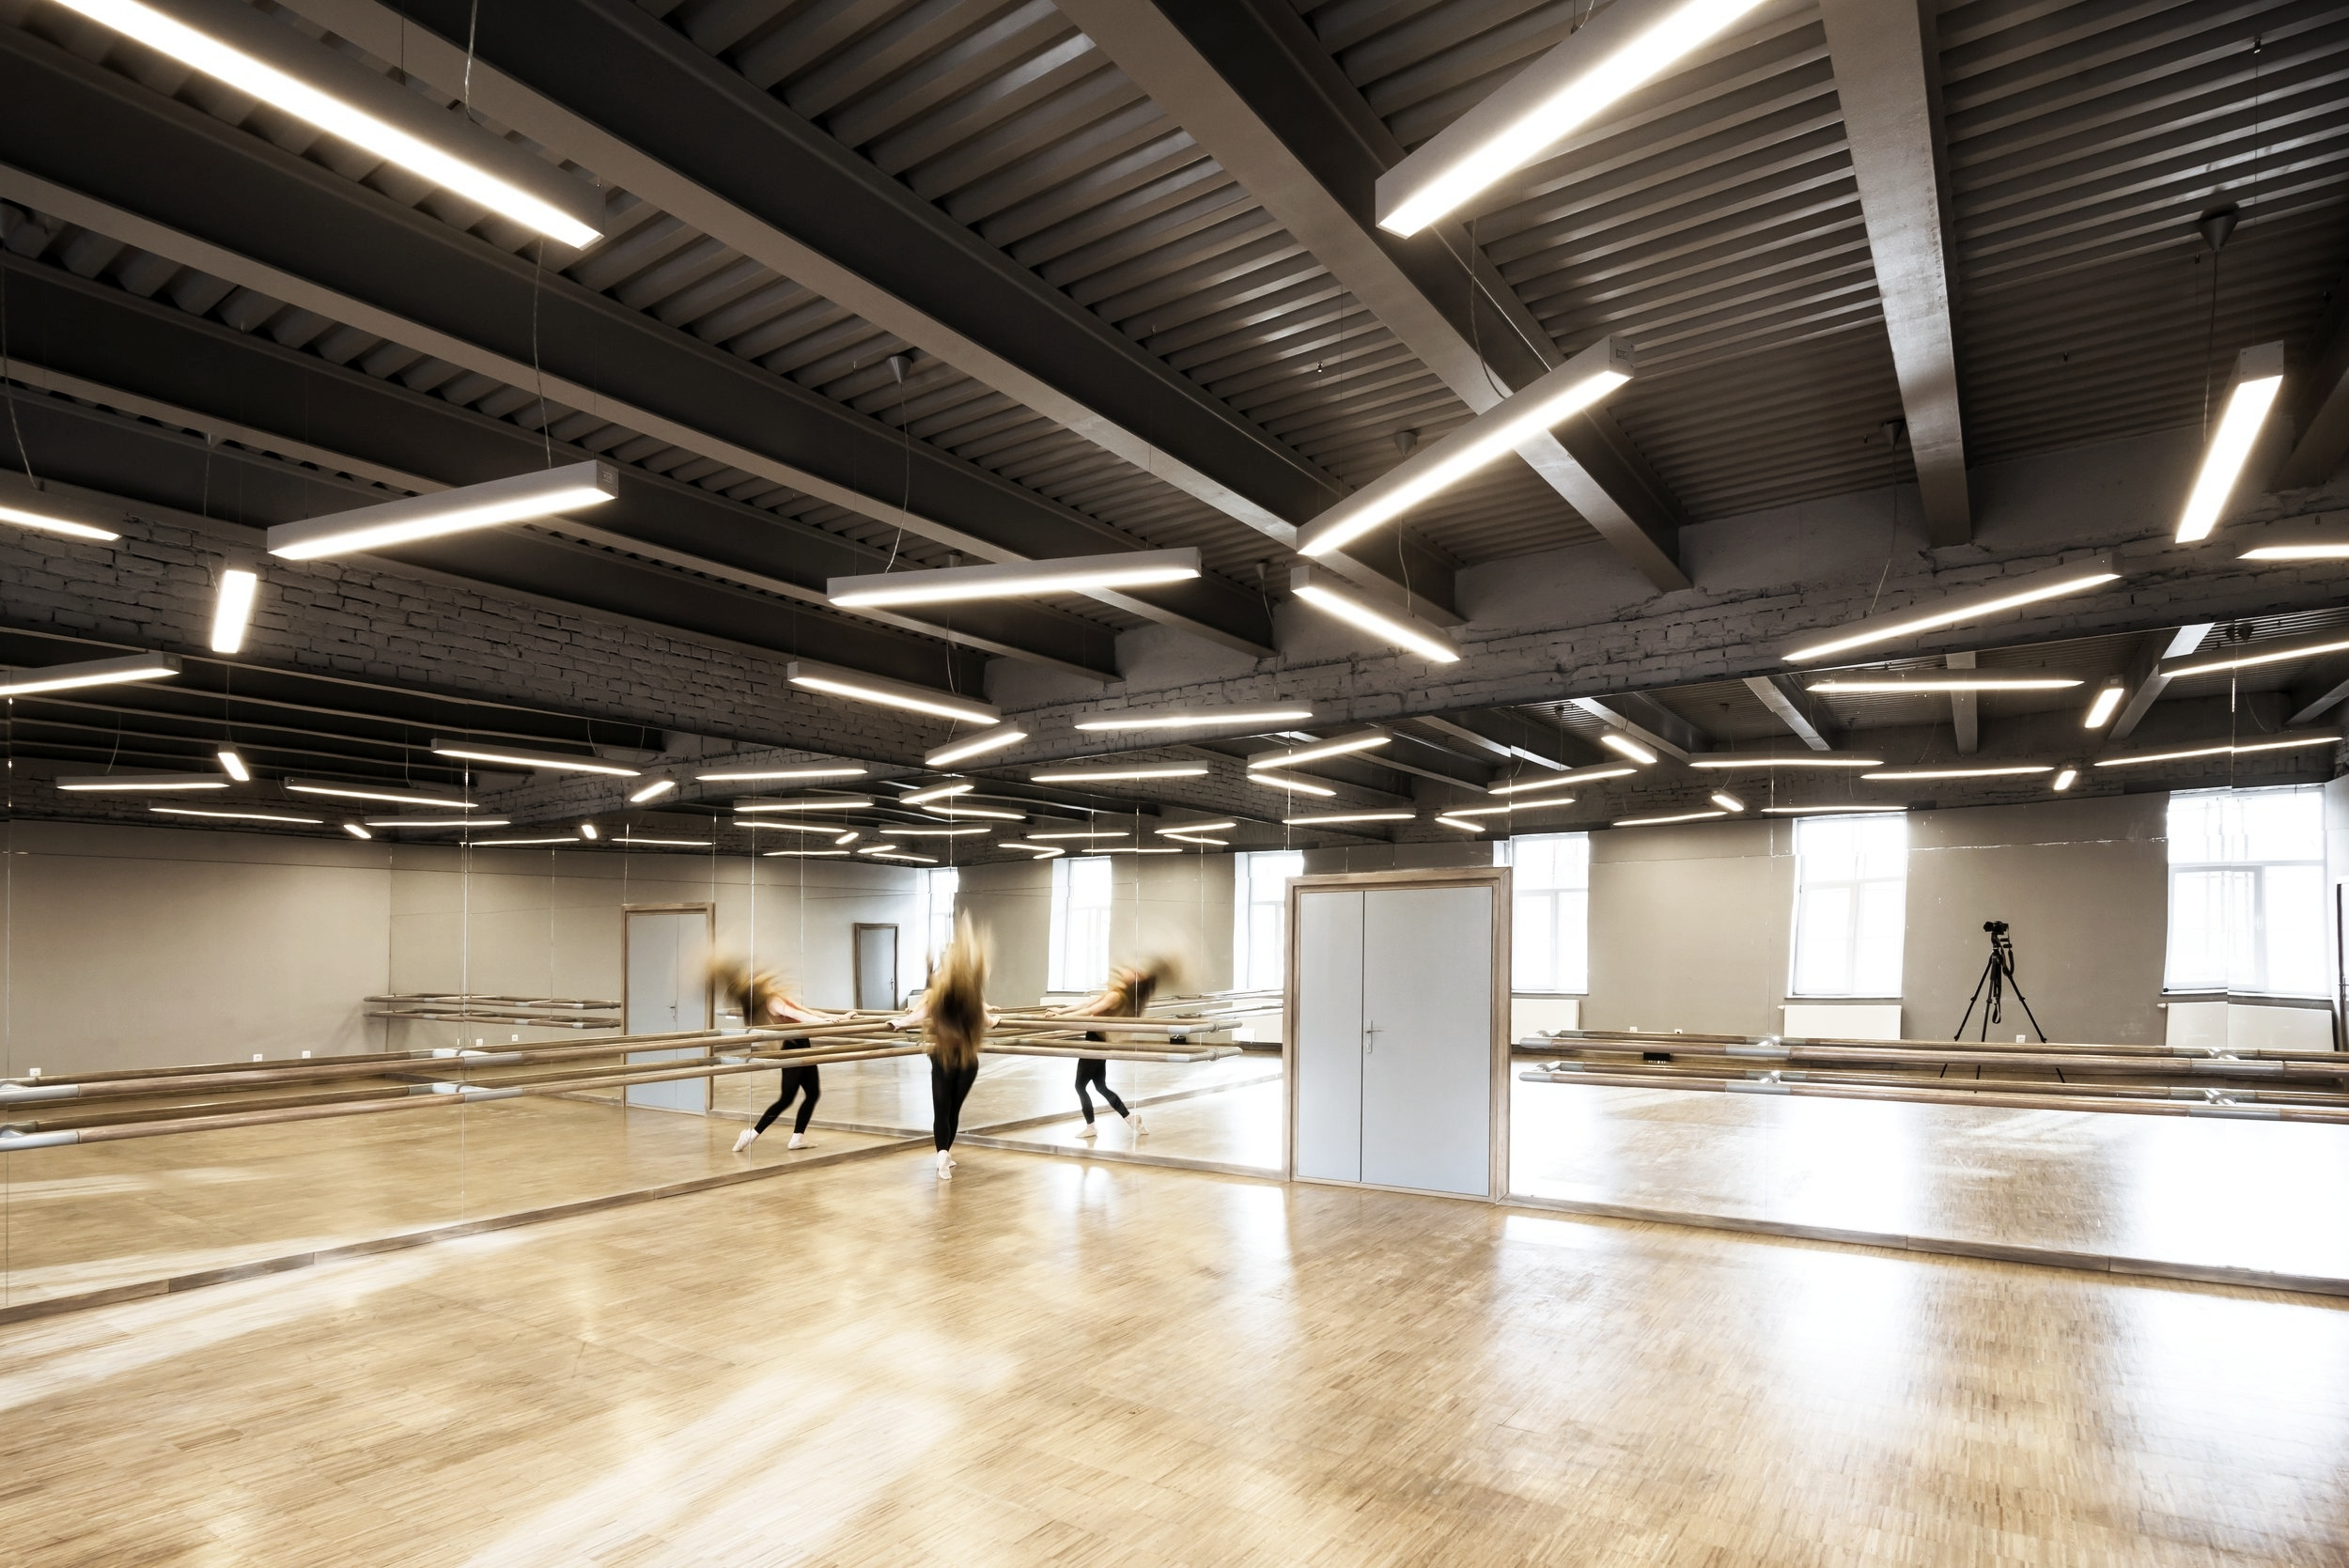 2.choreography studio classic:modern:contemporary dance.jpg